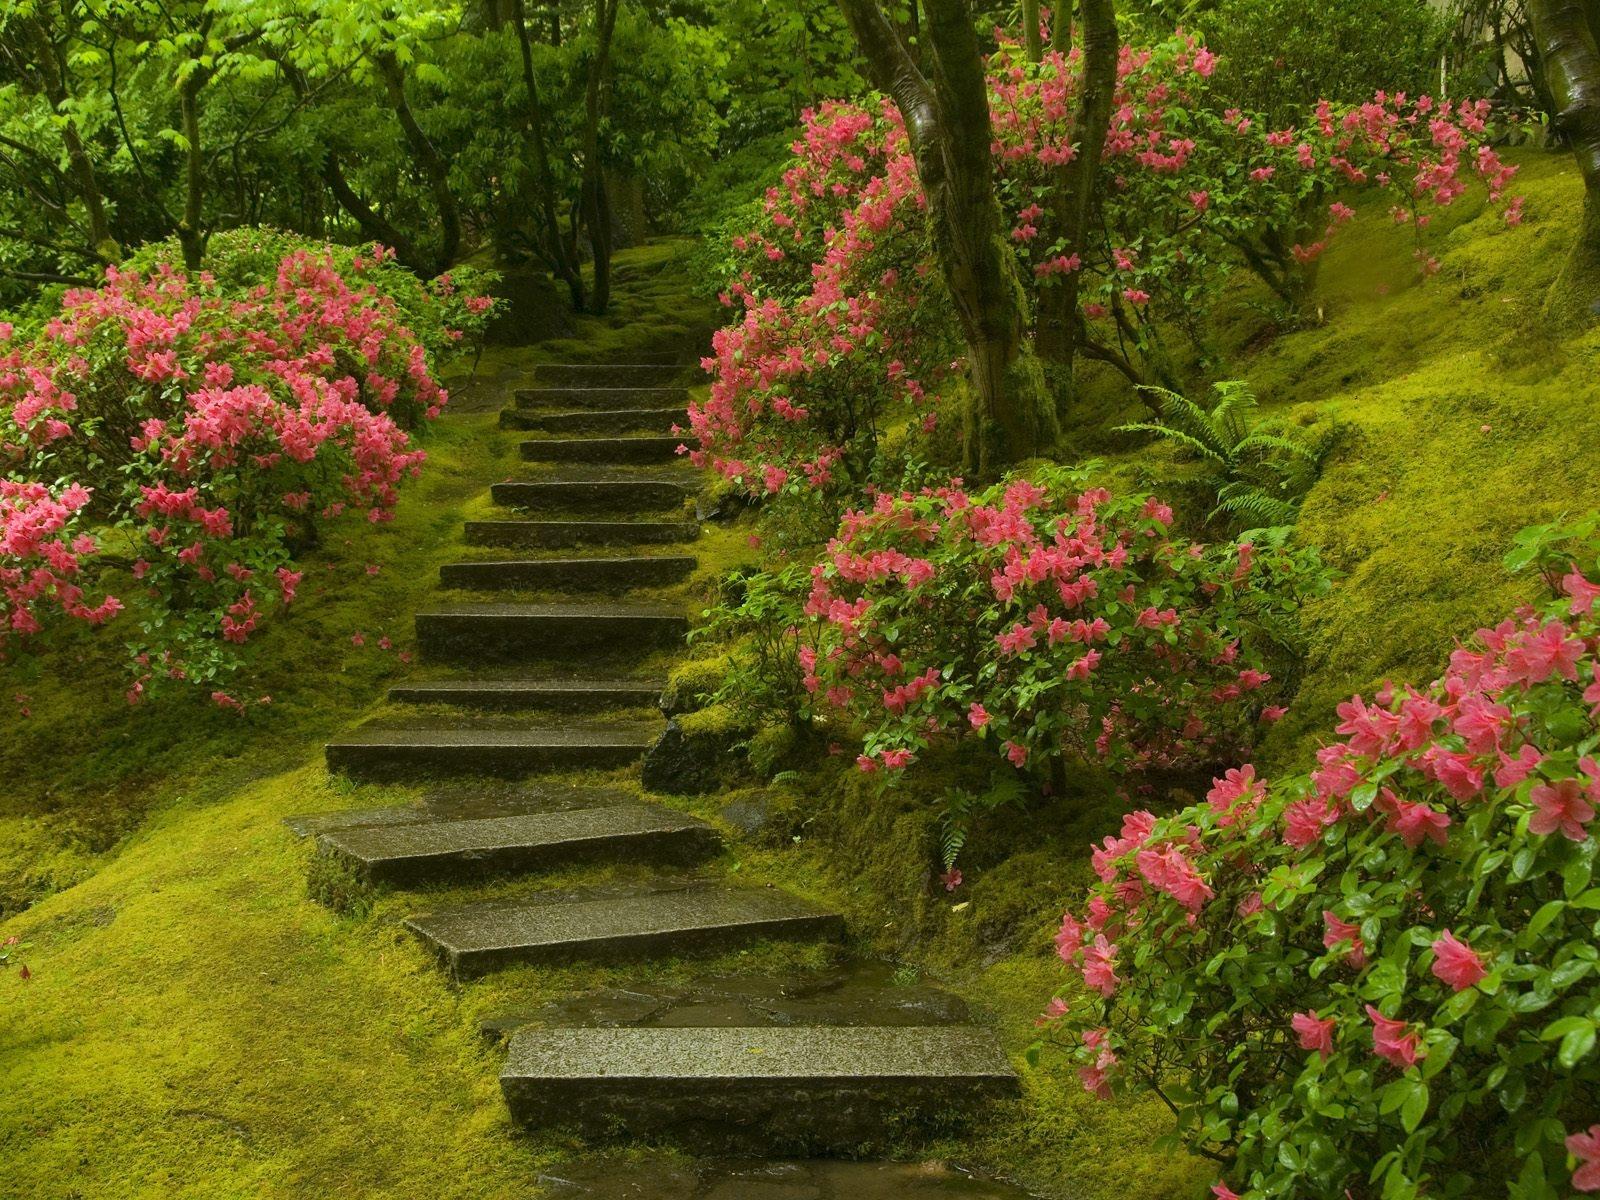 Japanese Garden Washington Park Wallpapers In Jpg Format